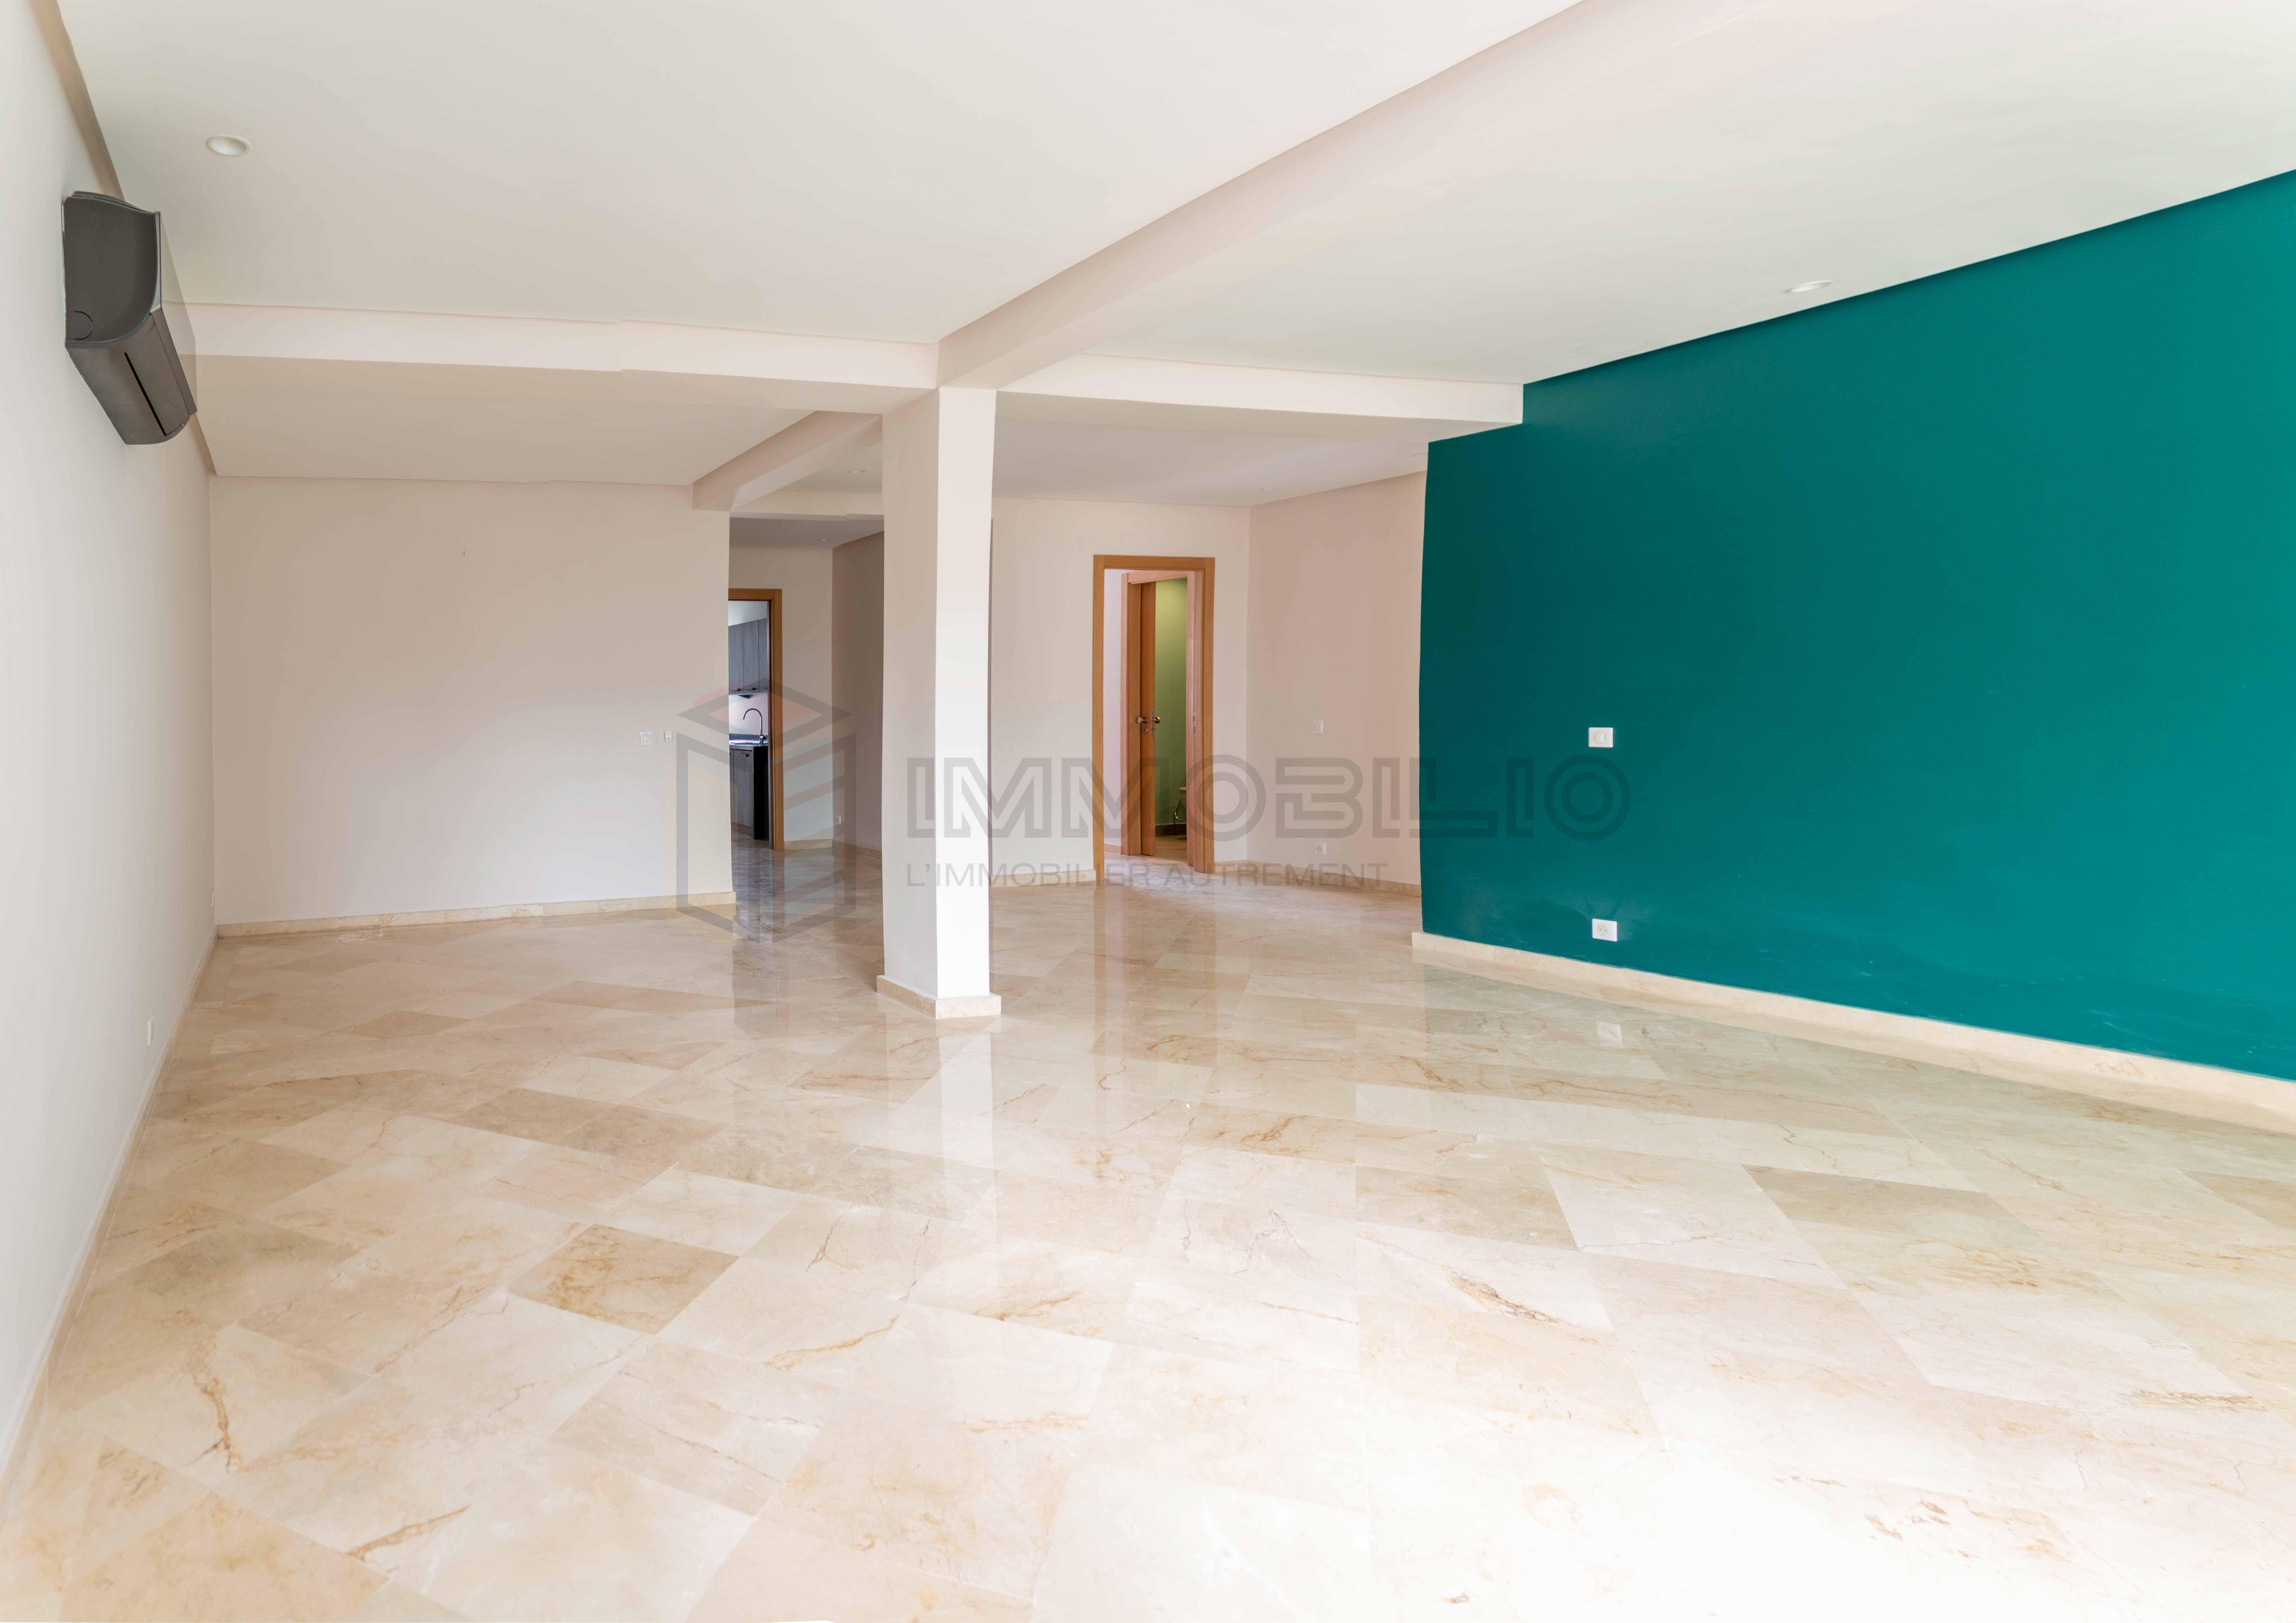 49+ Appartement a vendre casablanca ideas in 2021